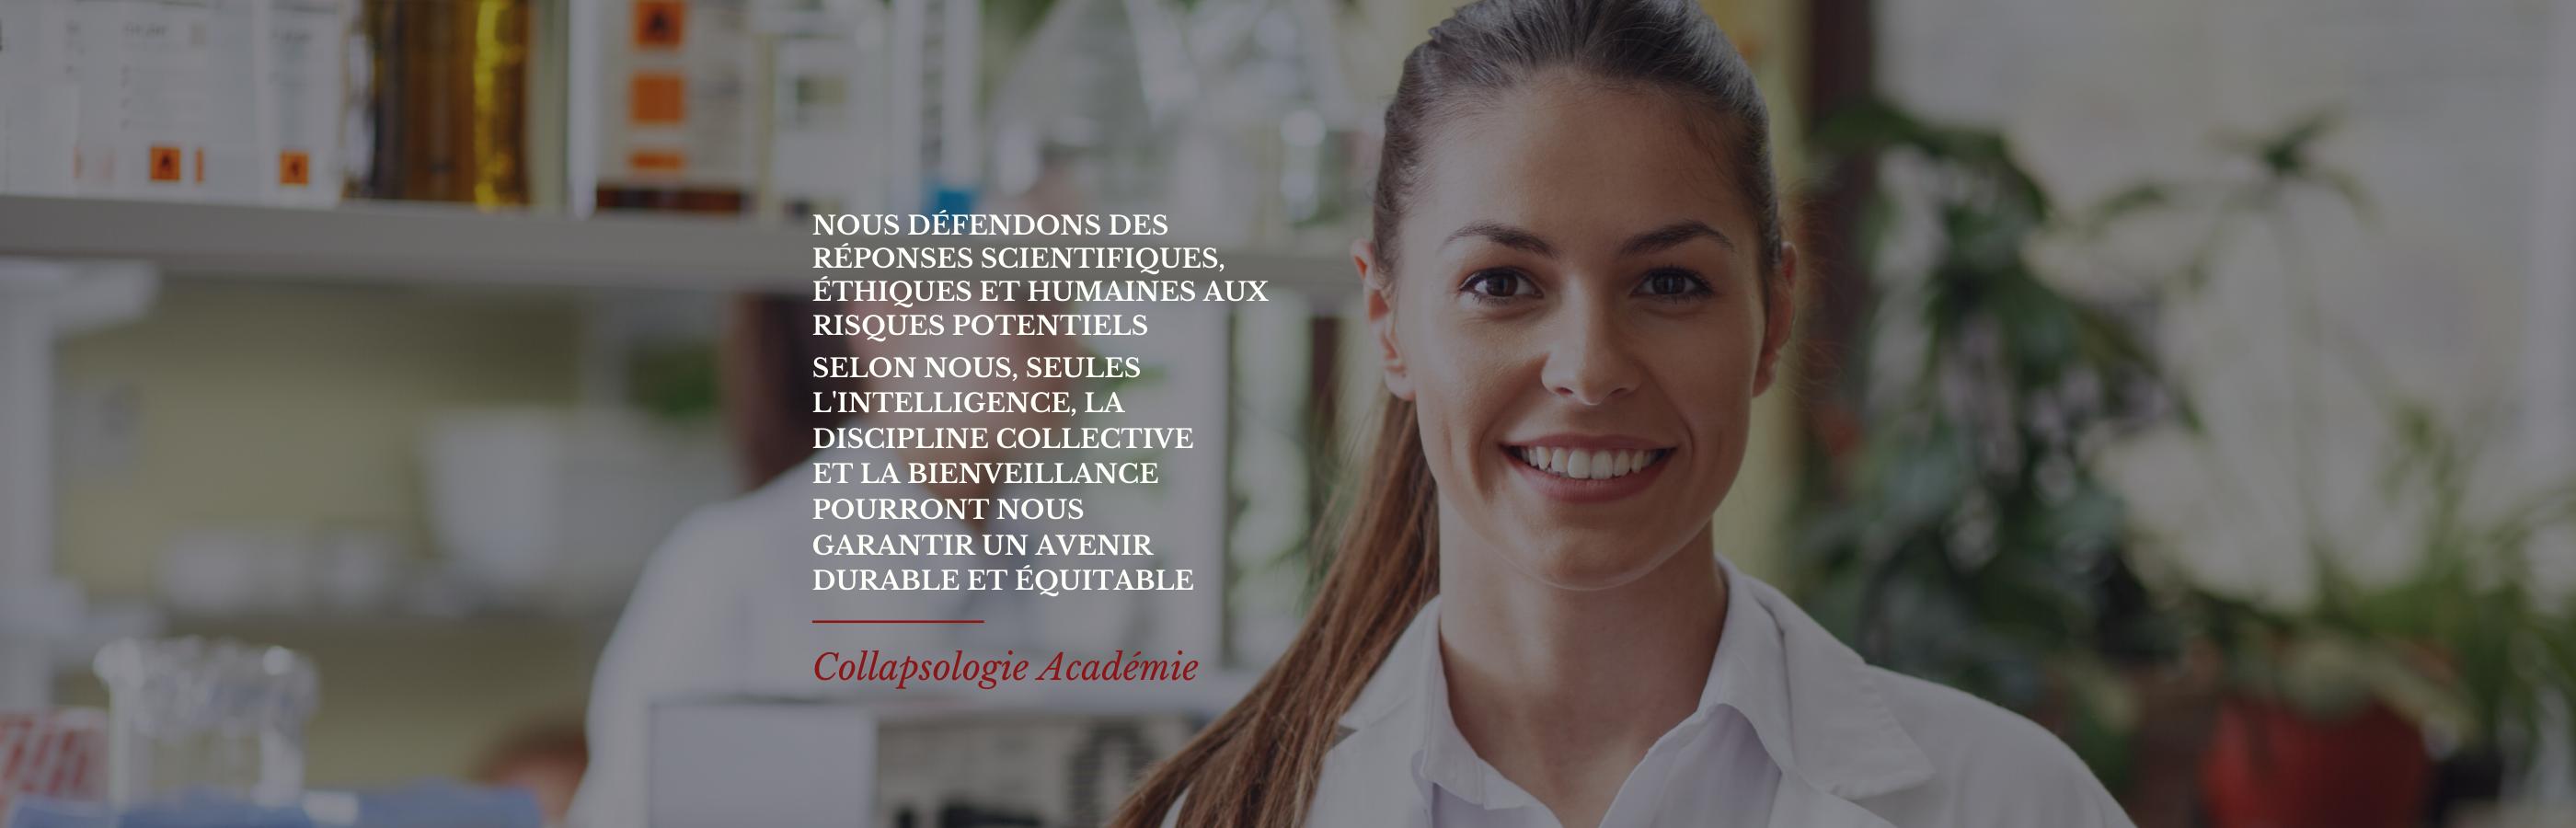 Collapsologie Academie Les scientifiques